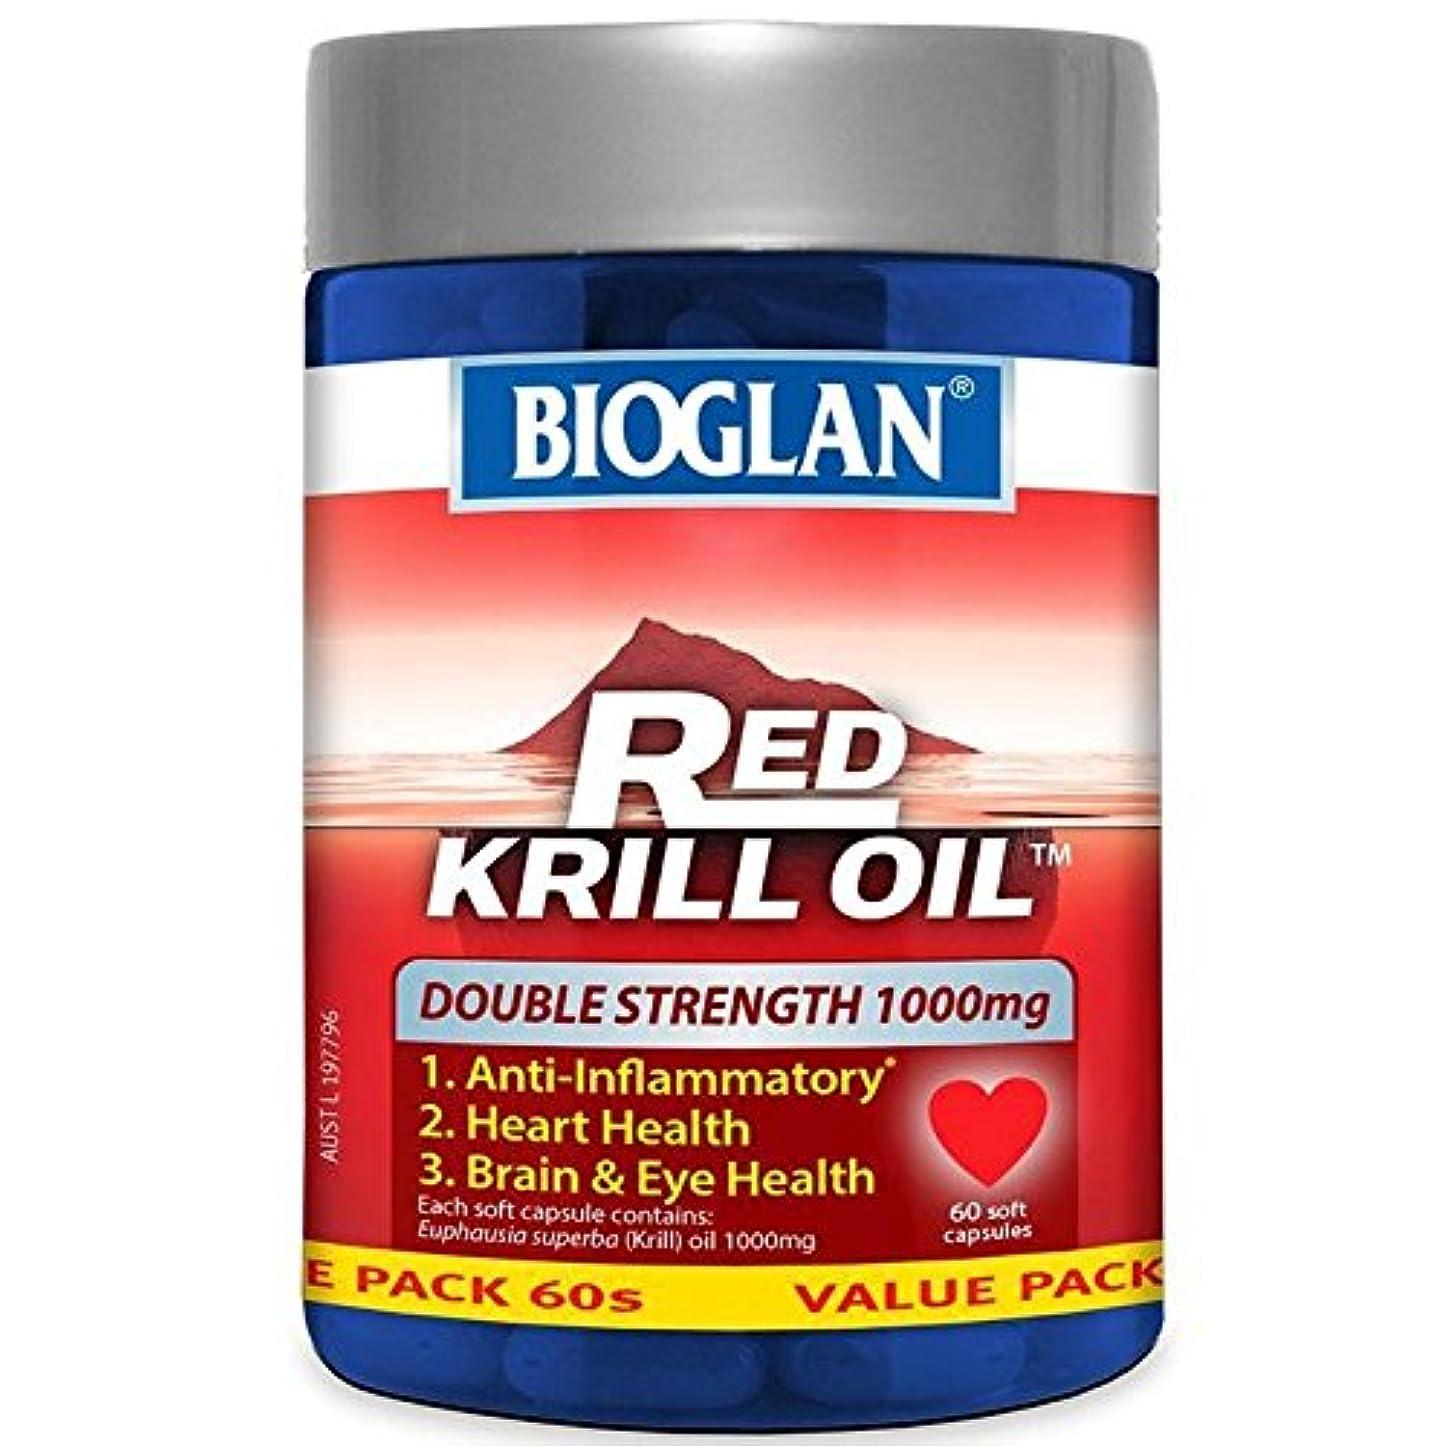 Bioglan(バイオグラン) レッドクリルオイル 1000mg カプセル60錠【海外直送品】 [並行輸入品]